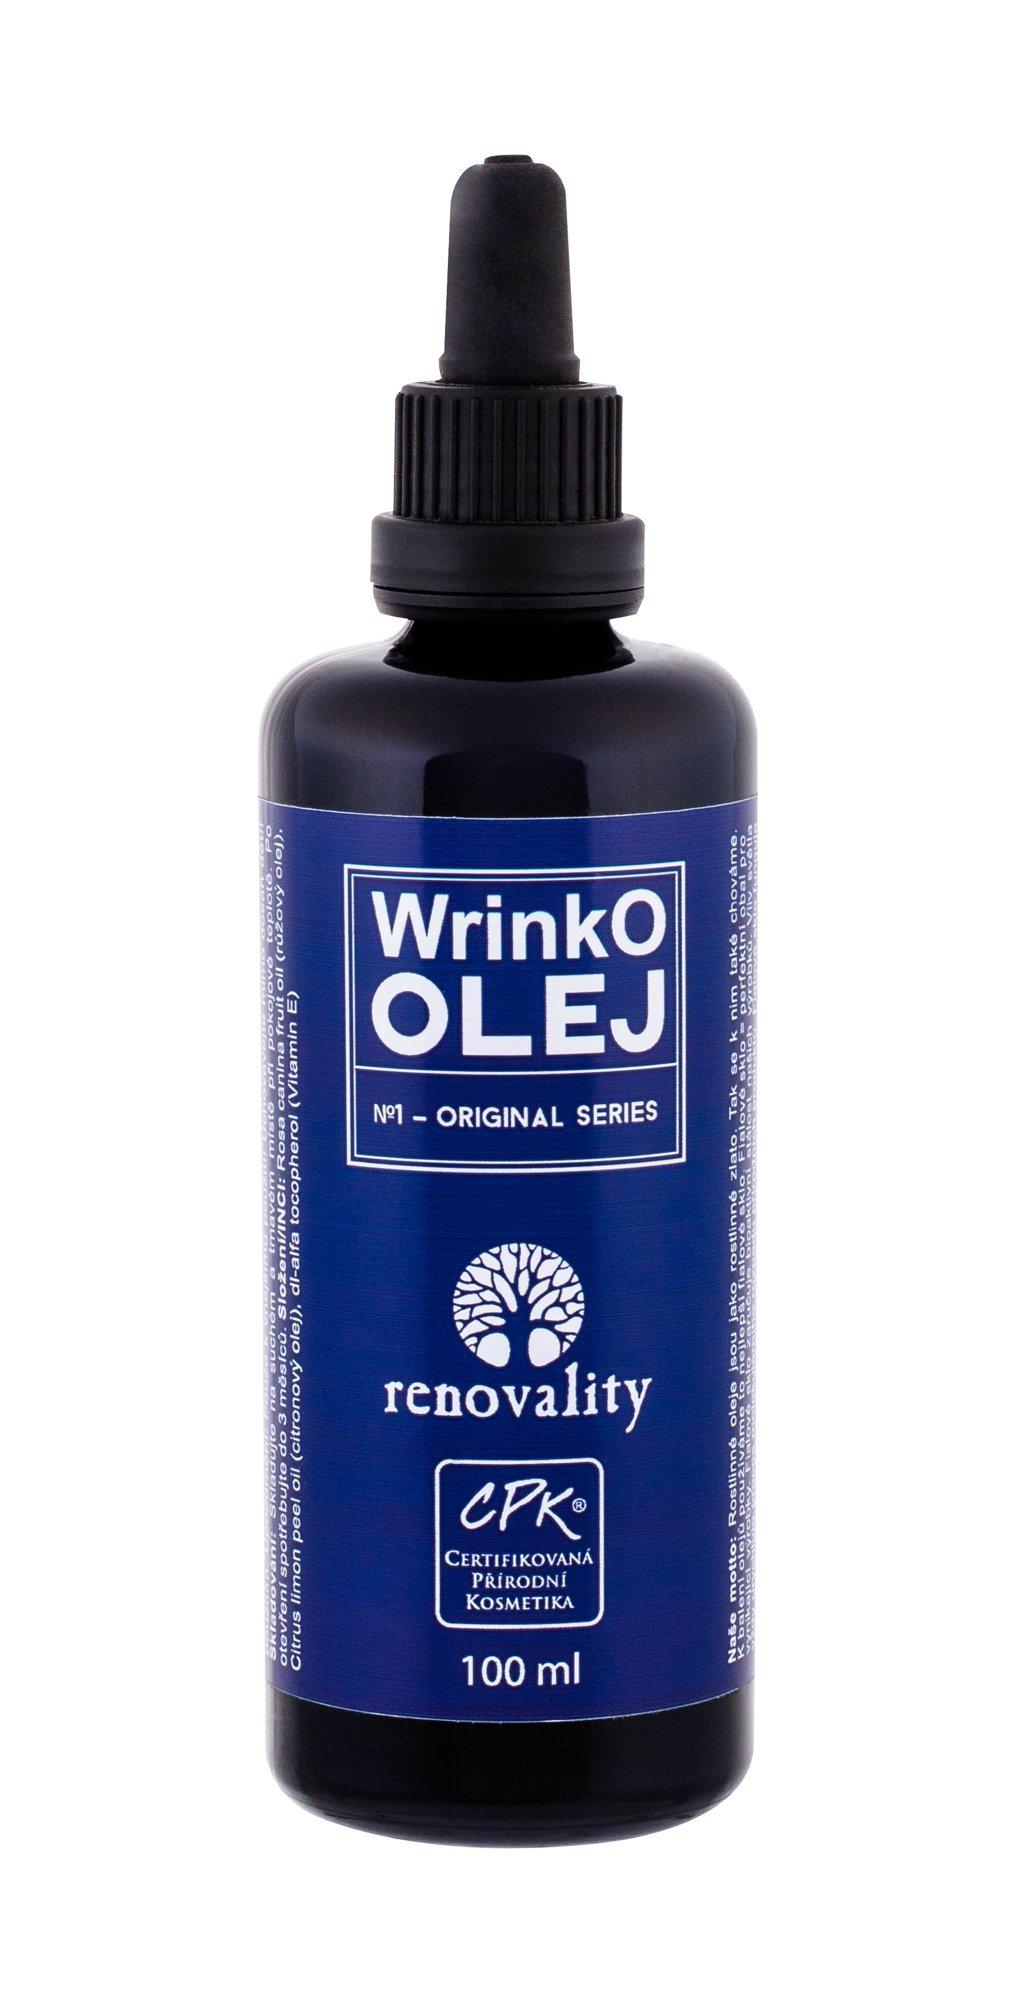 Renovality Original Series Massage Oil 100ml  WrinkO Oil